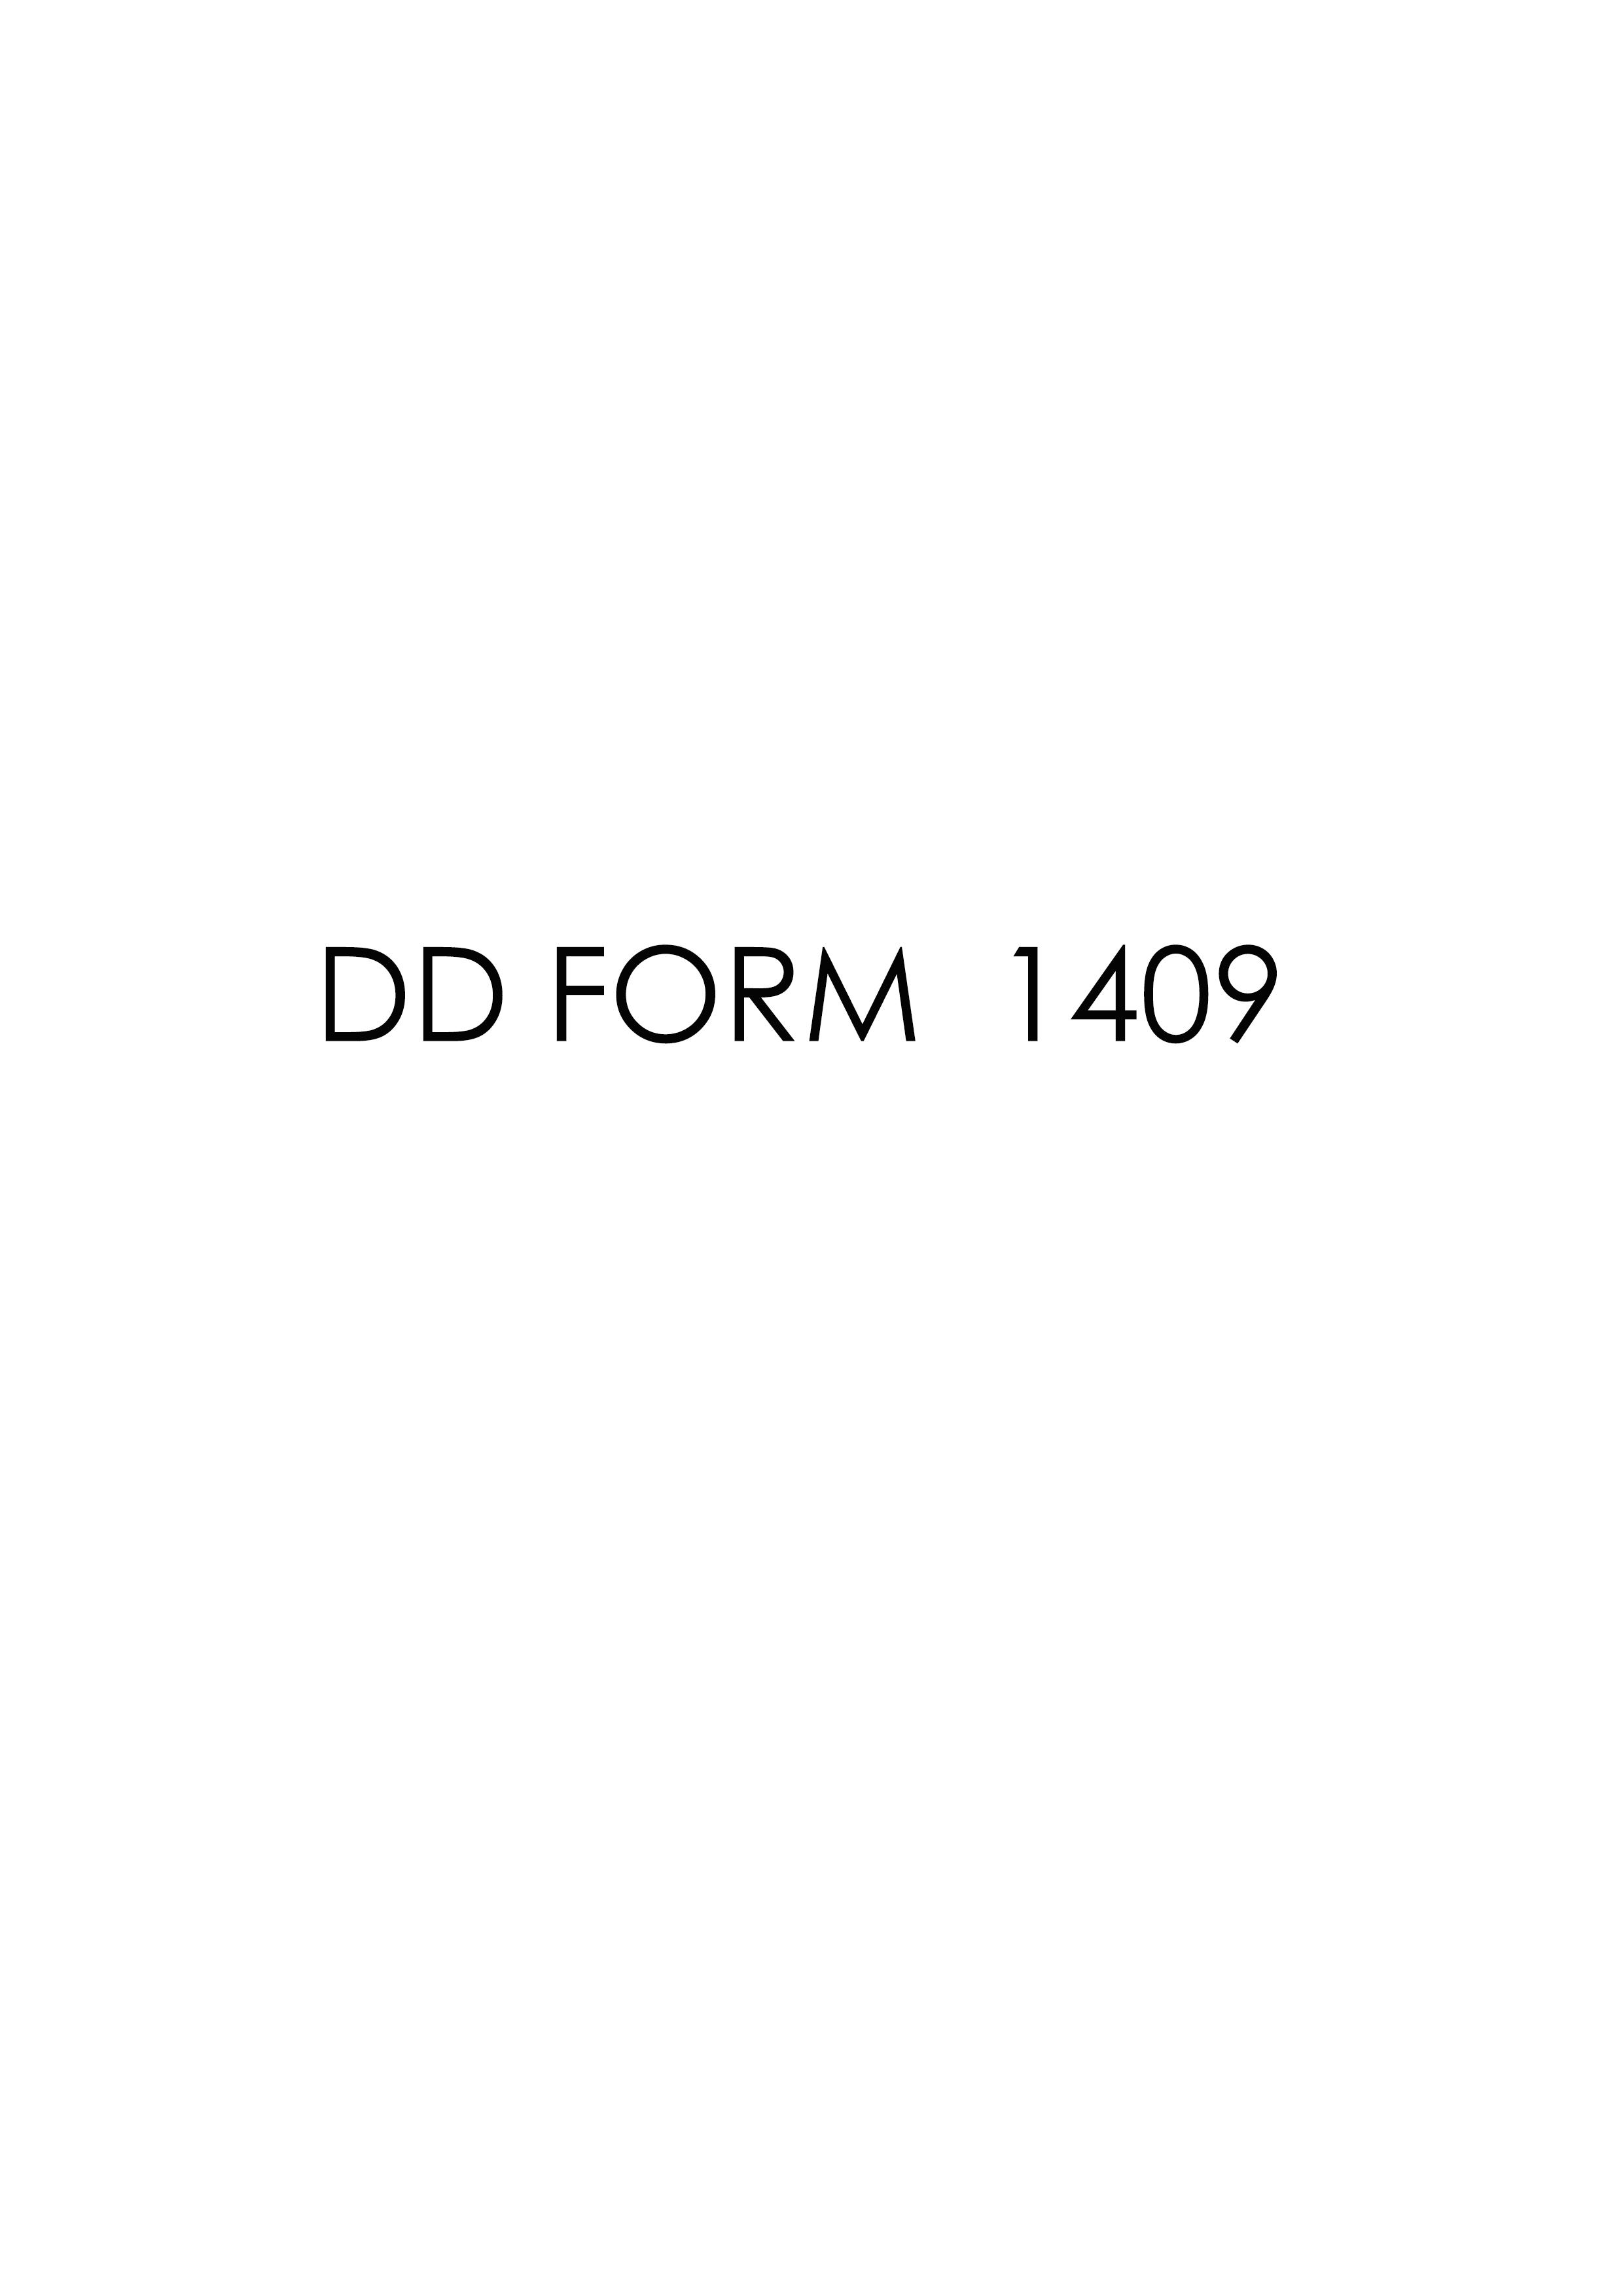 Download dd Form 1409 Free